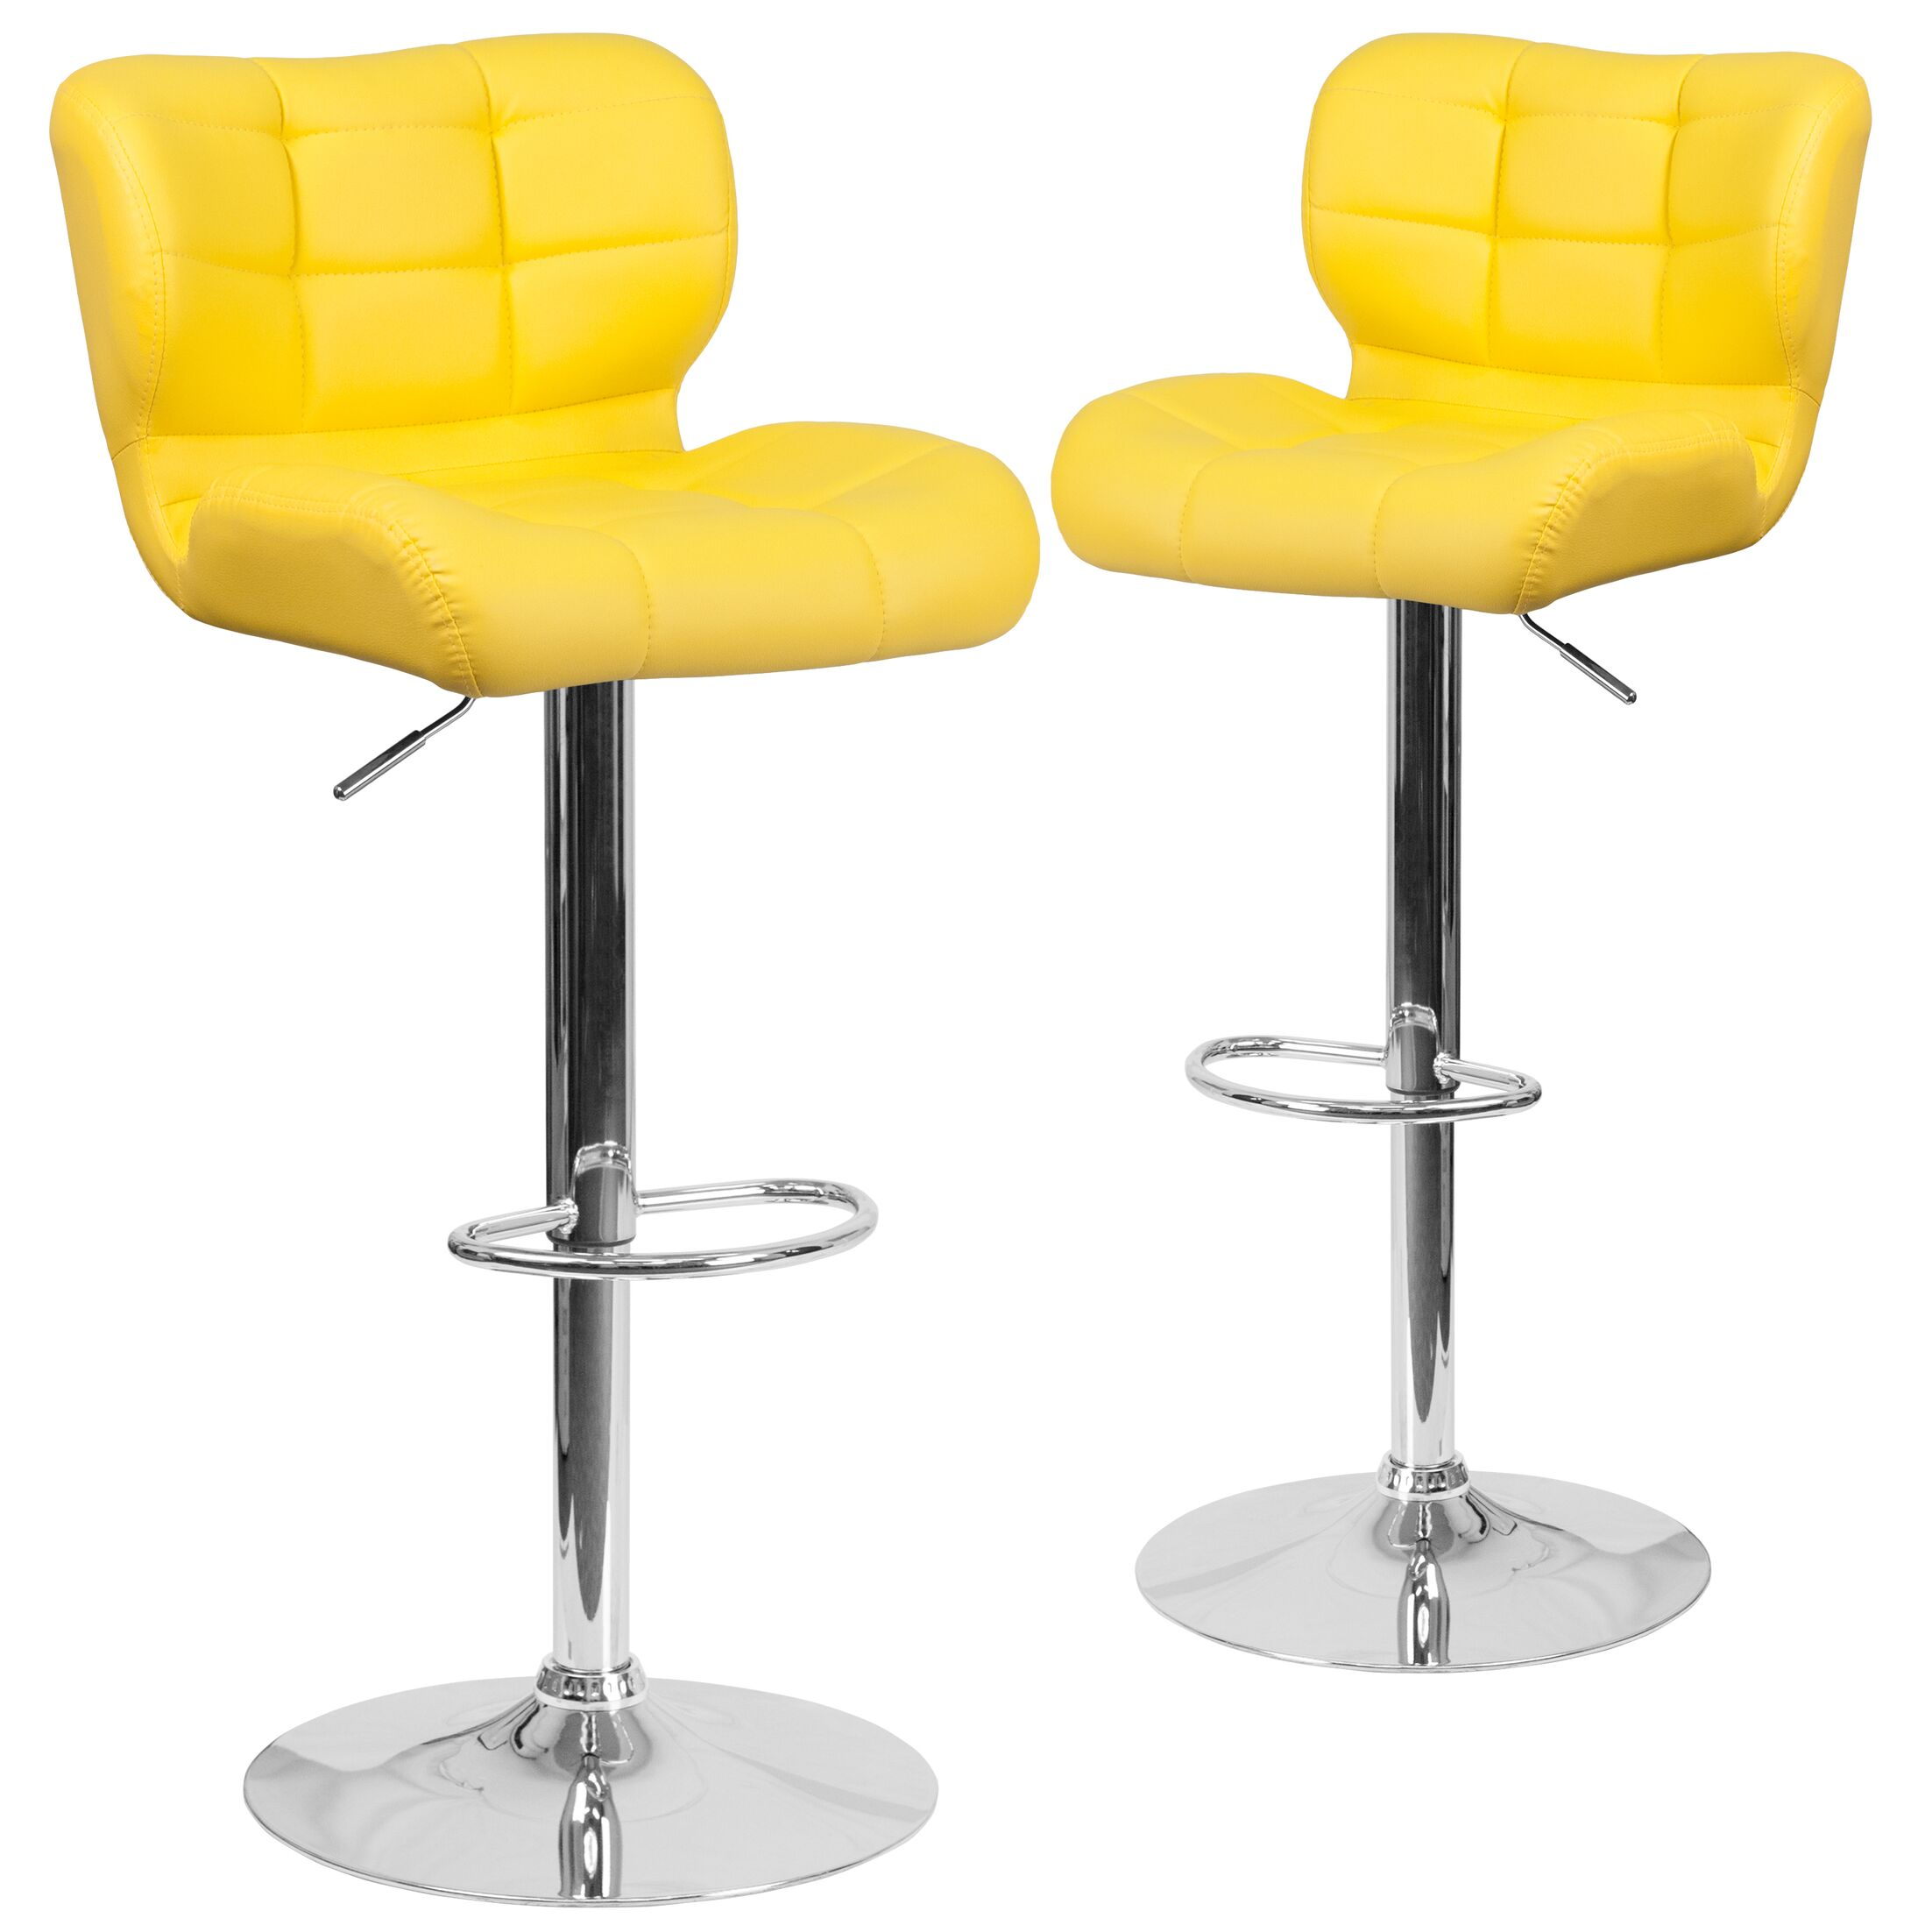 North Widcombe Adjustable Height Swivel Bar Stool Upholstery: Yellow